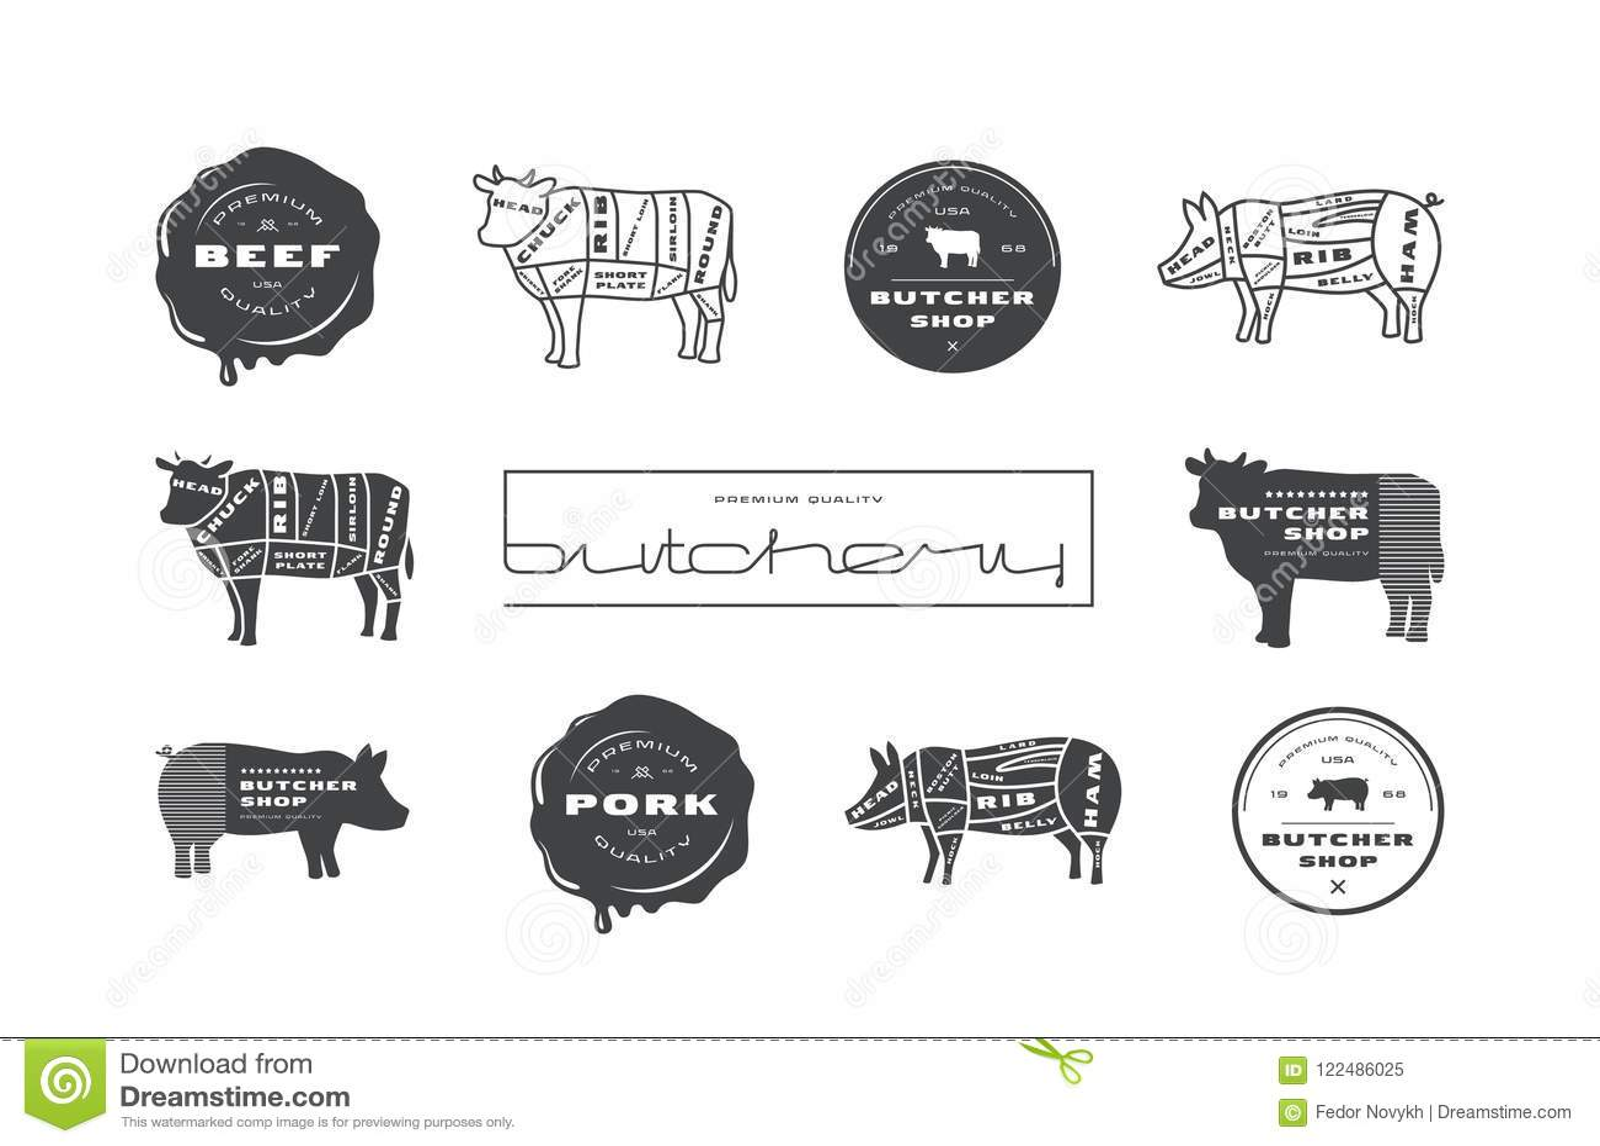 pork beef cuts diagrams labels stamps butcher shop stock vector pork beef cuts diagrams labels stamps butcher shop 122486025 pork, beef cuts diagrams, labels and stamps for butcher shop stock